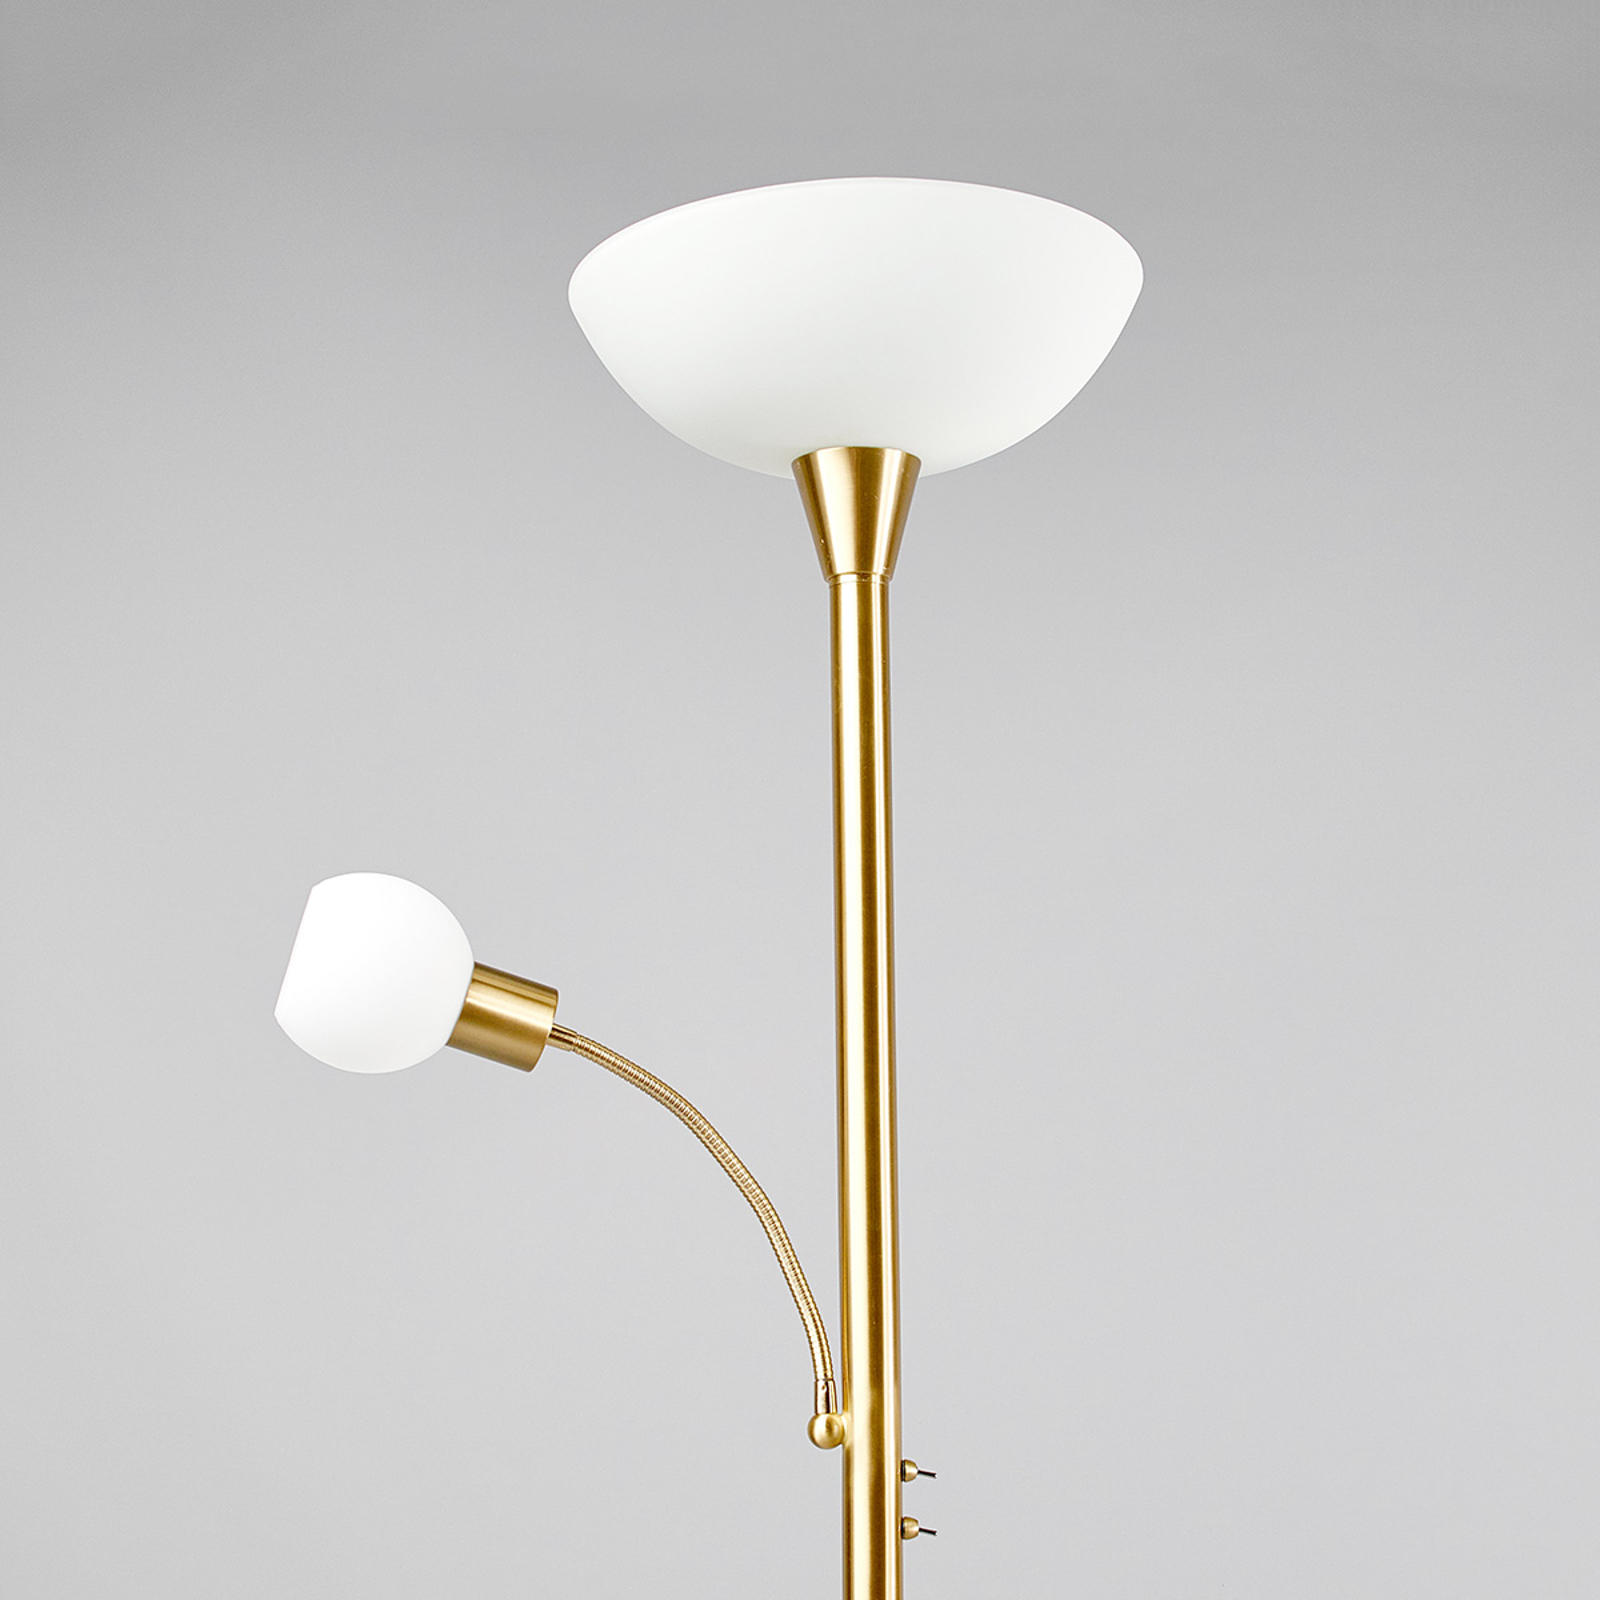 Lampa oświetlająca sufit LED ELAINA, mosiężna